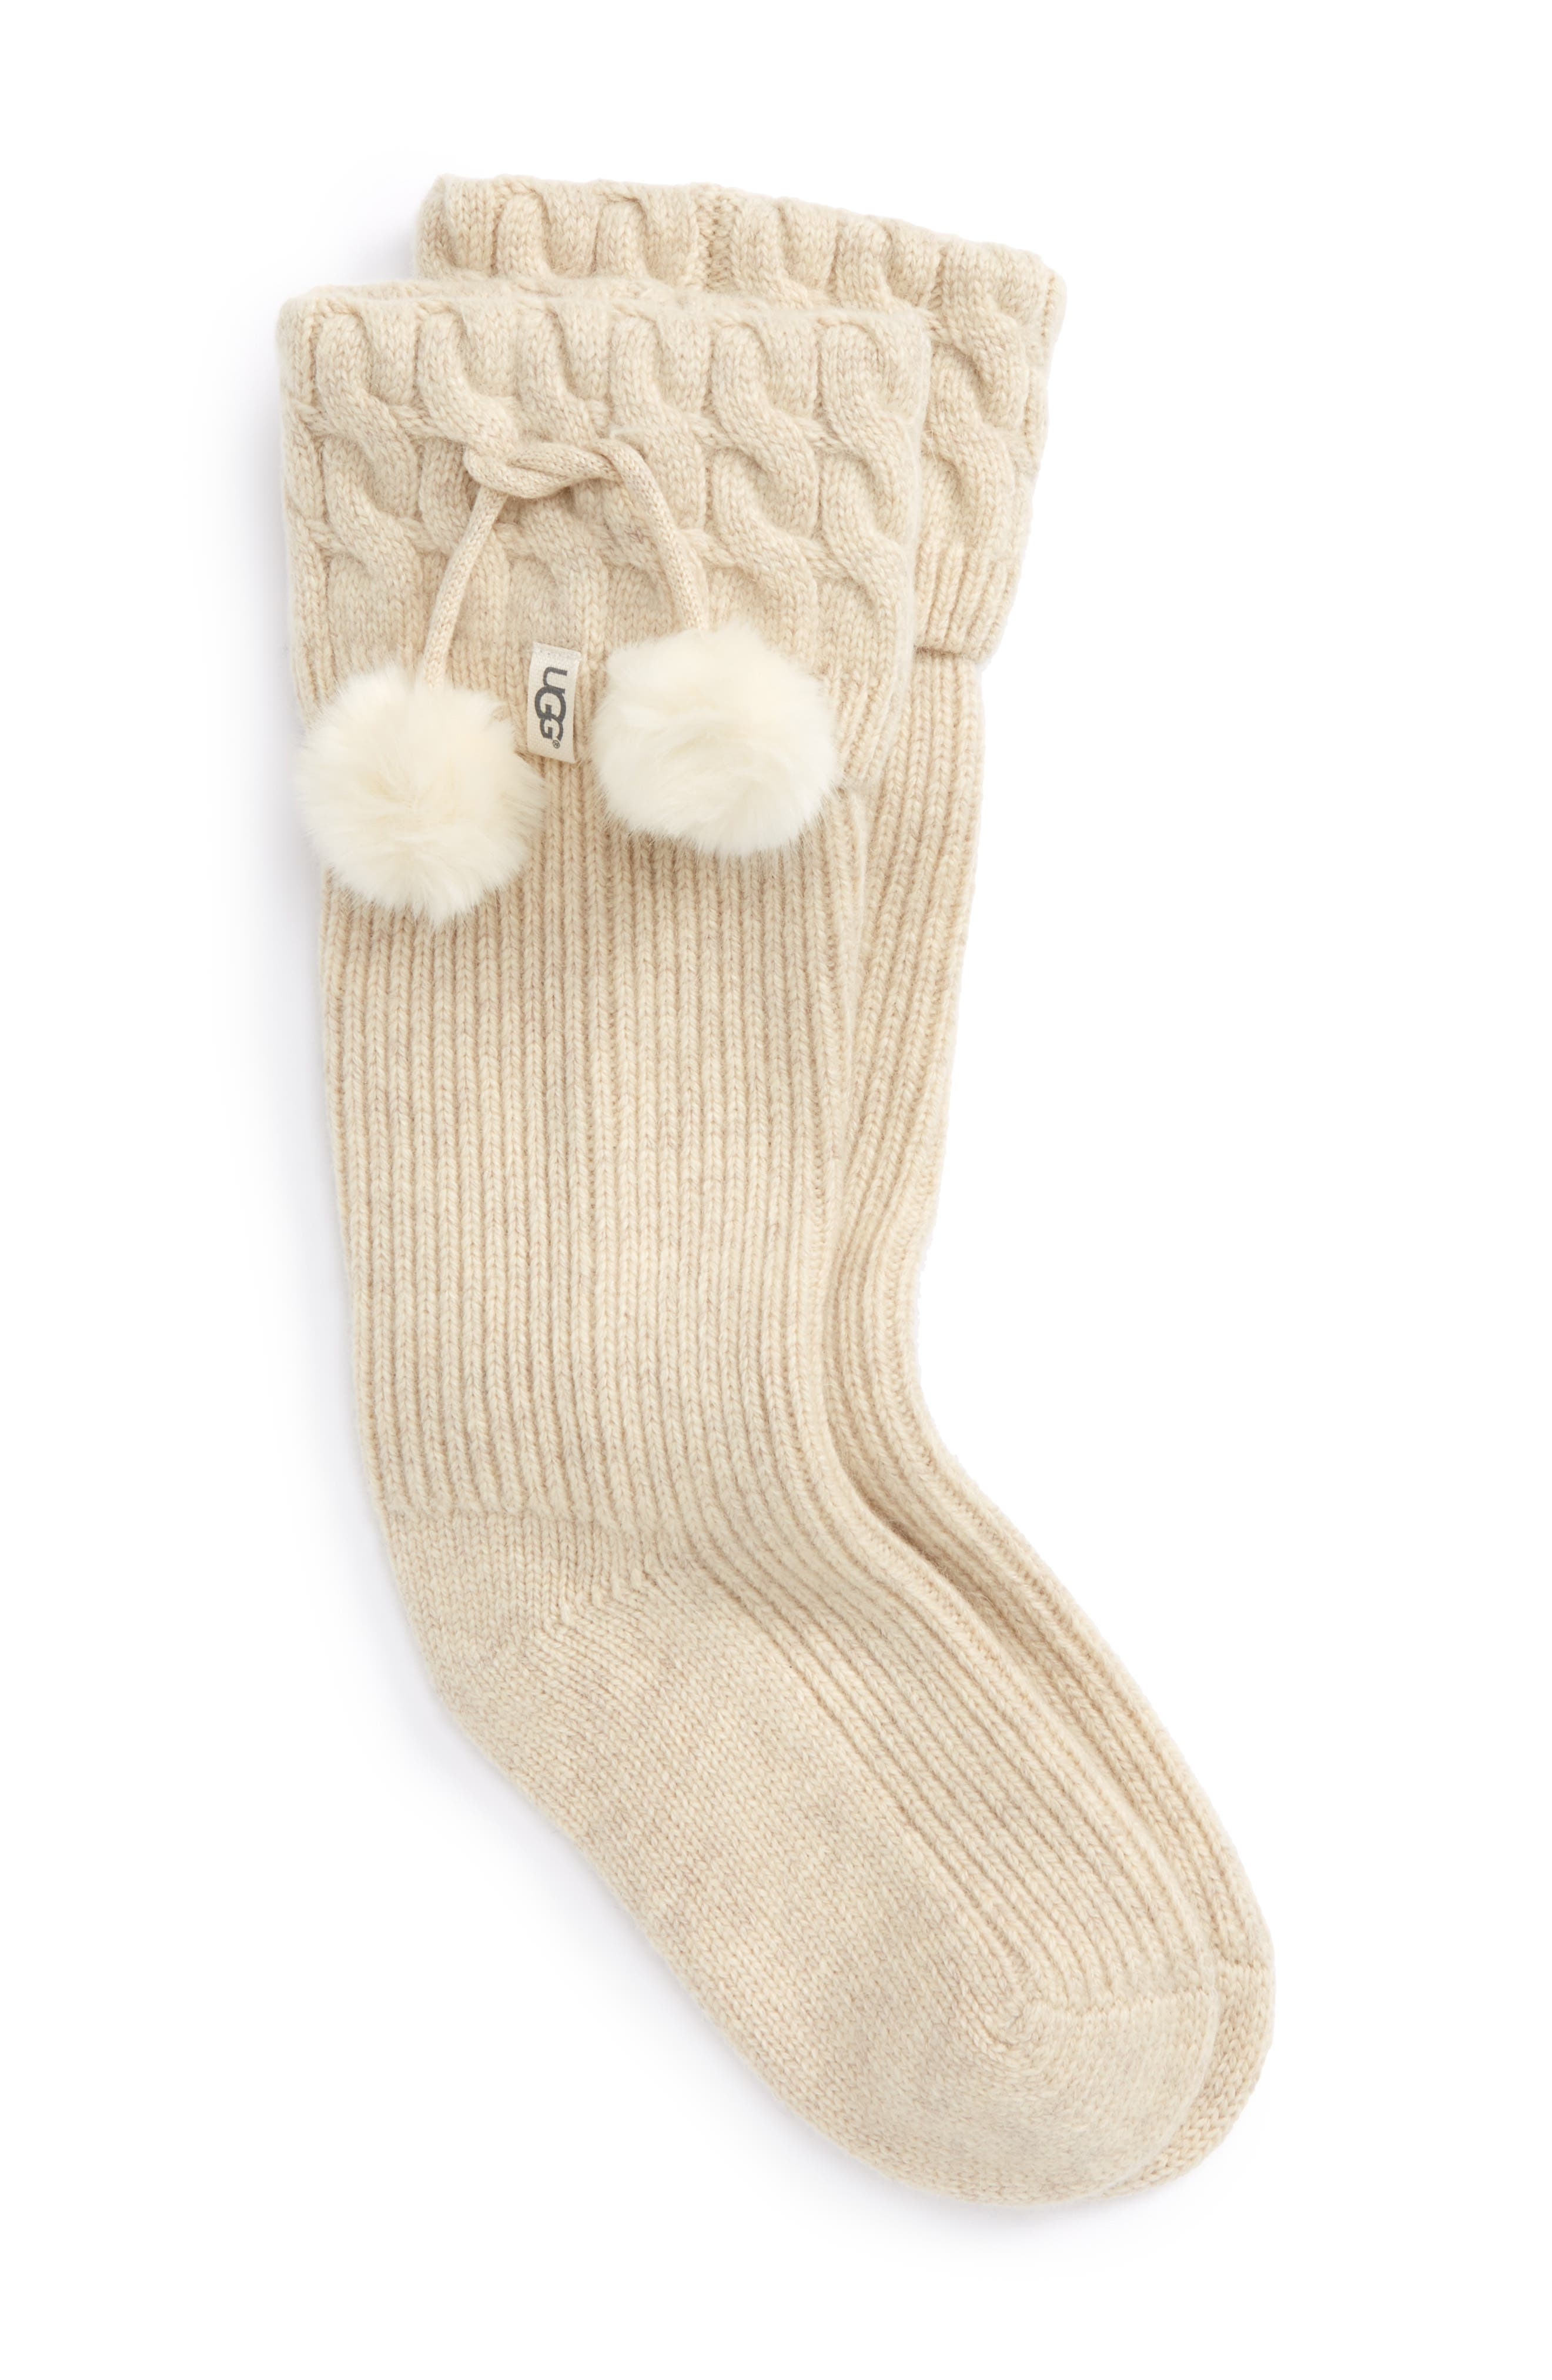 UGG UGGpure<sup>™</sup> Pompom Tall Rain Boot Sock,                             Main thumbnail 1, color,                             Cream Heather Wool